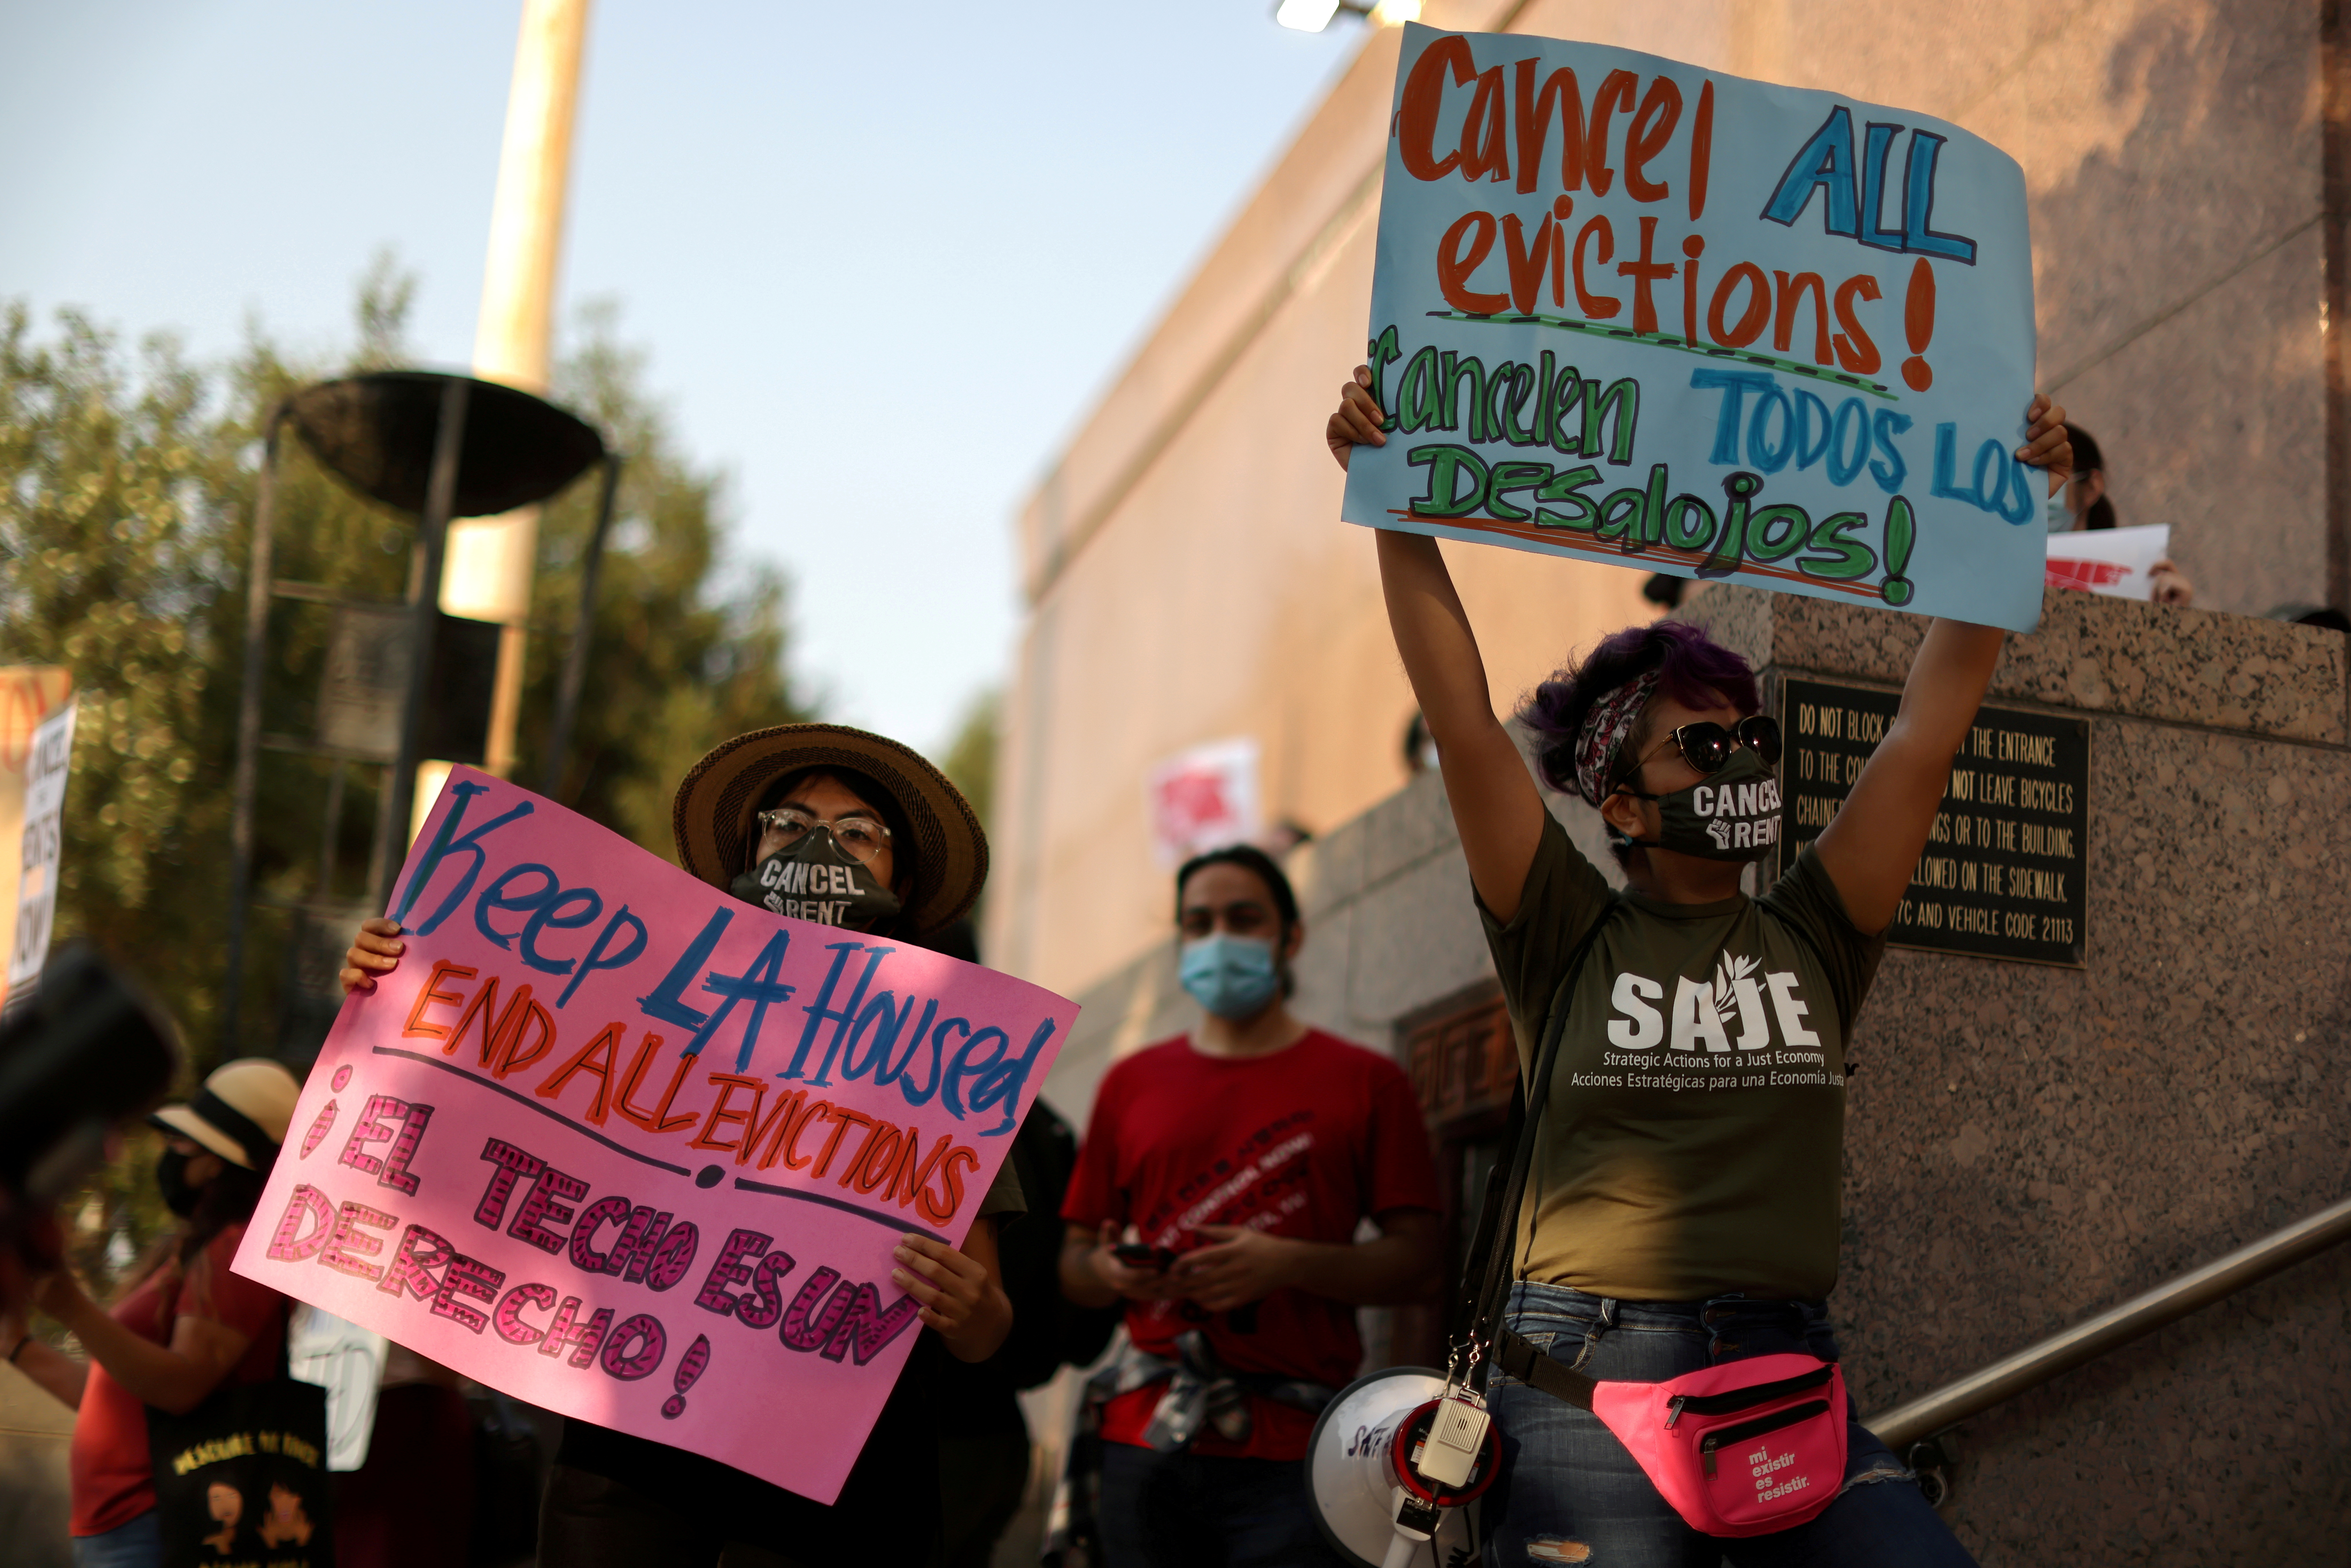 22 U.S. states urge Supreme Court to uphold CDC eviction ban